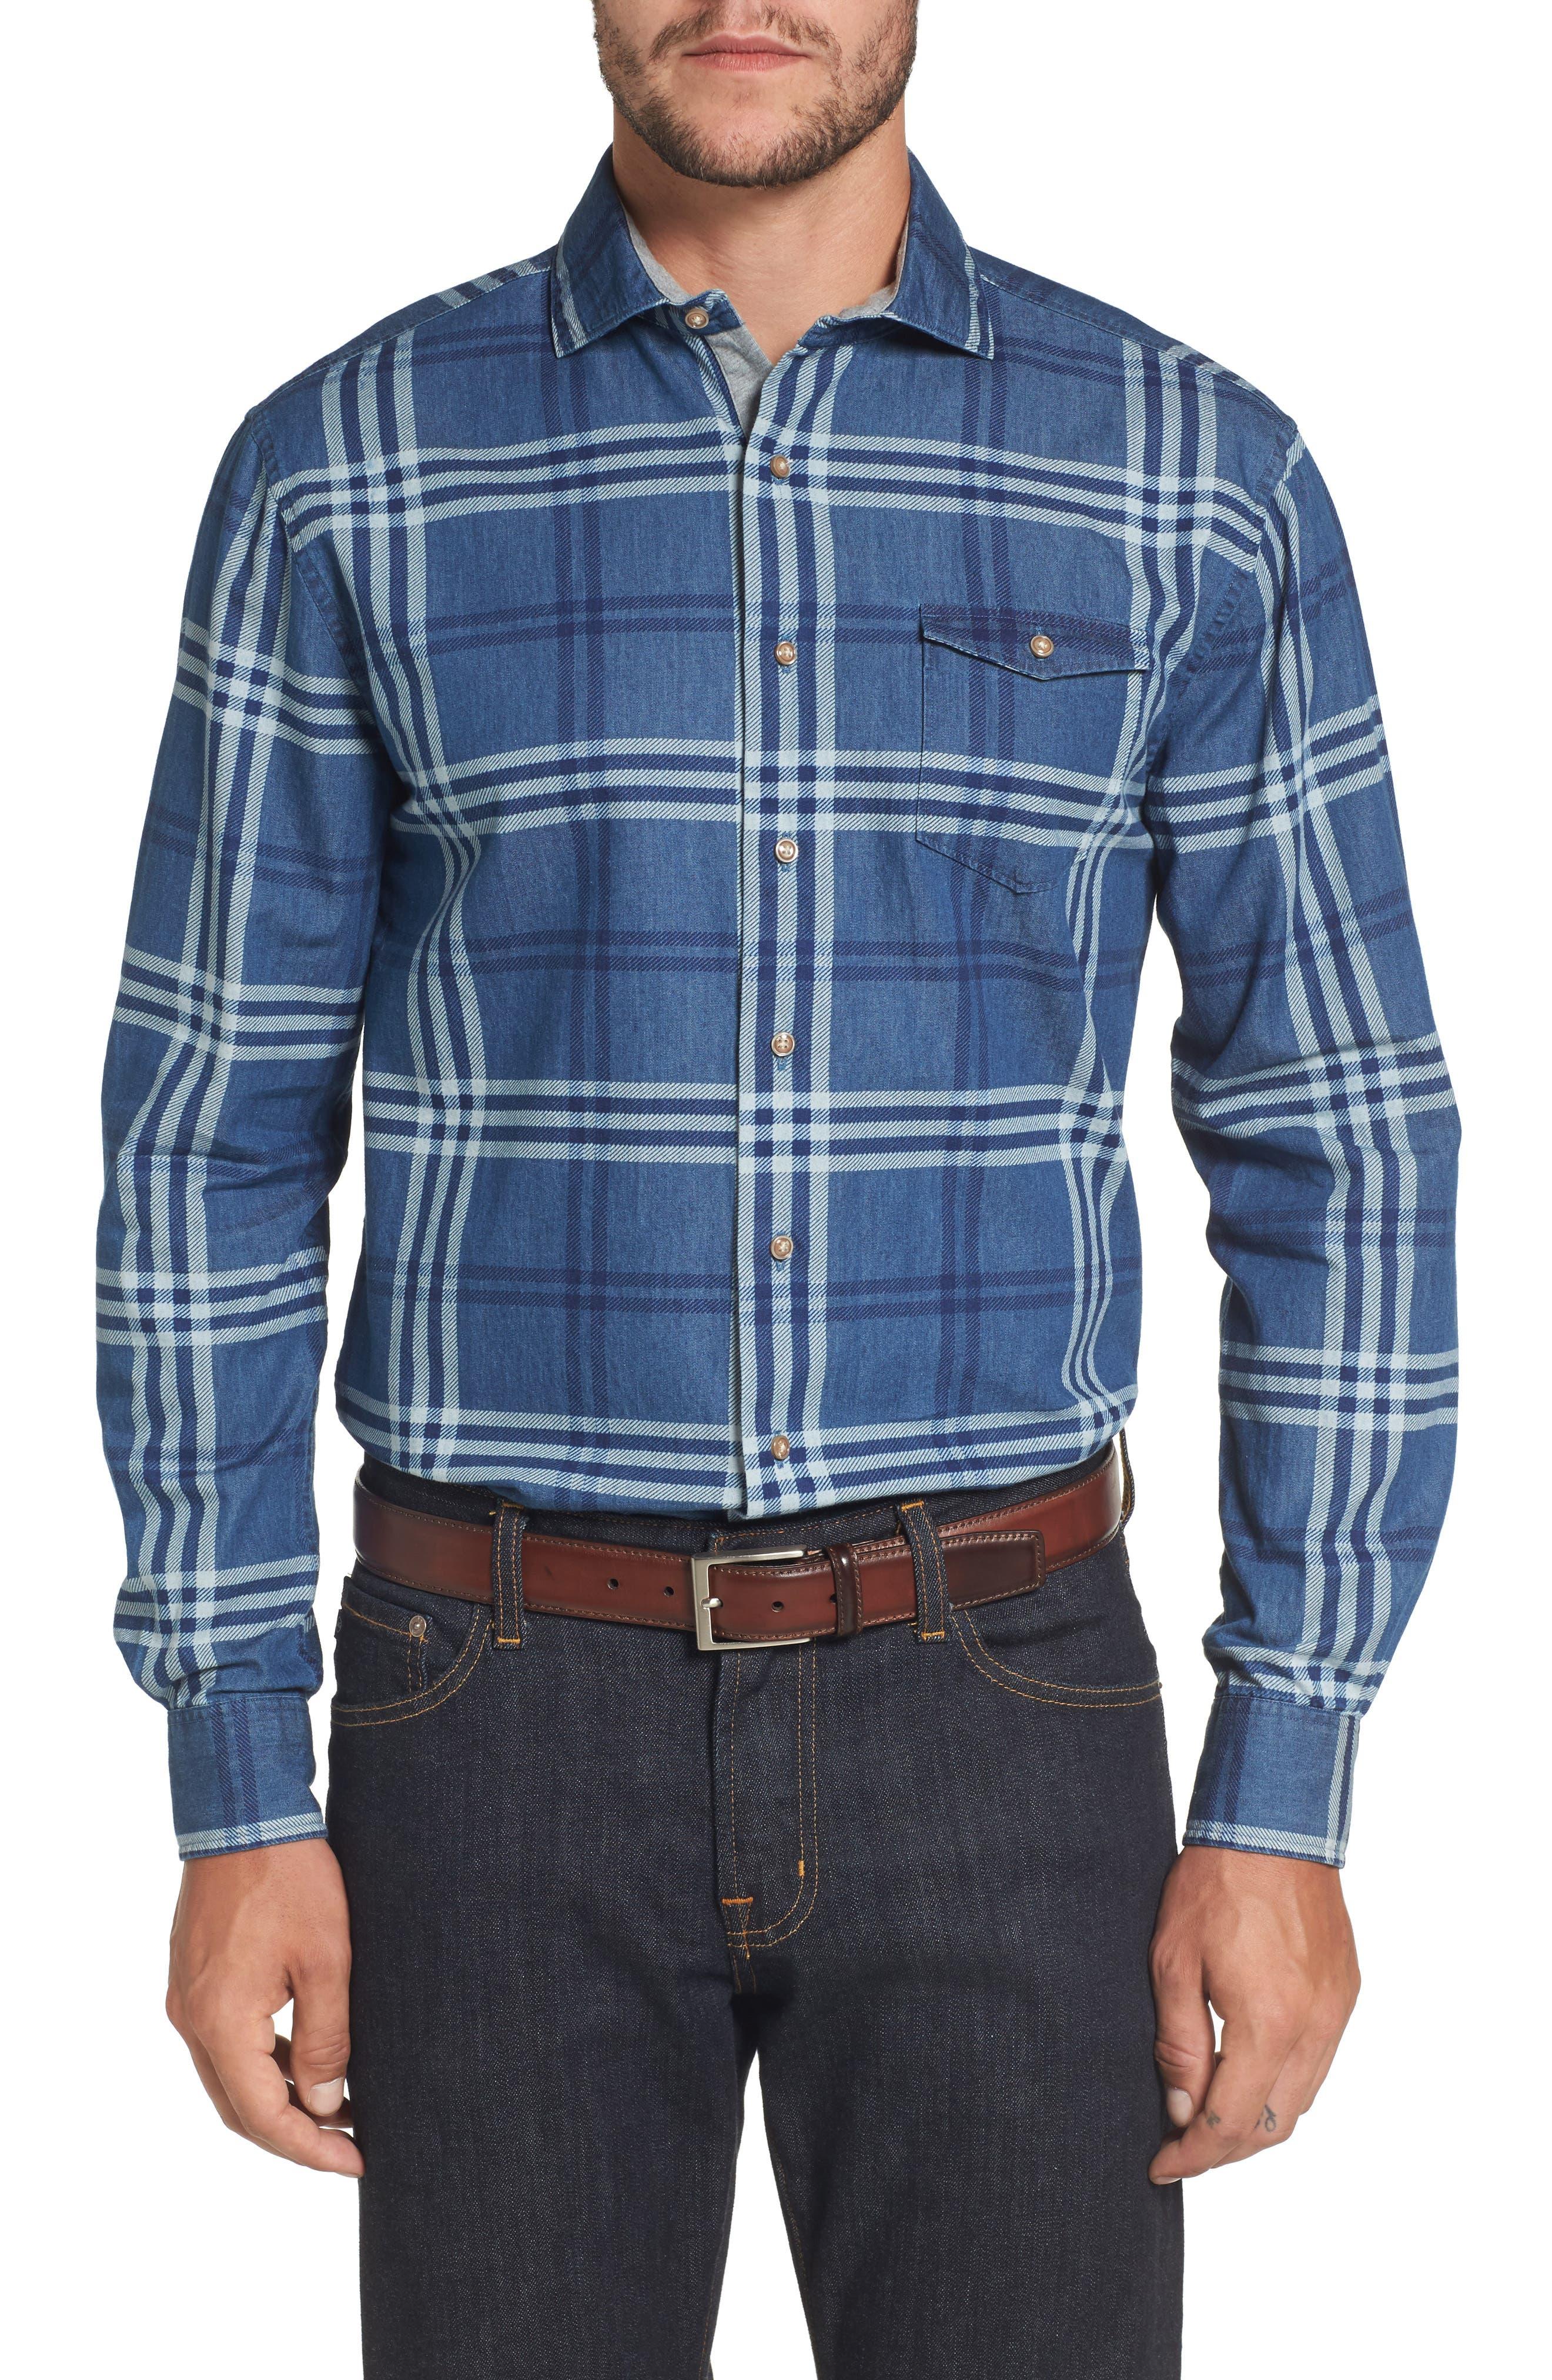 Main Image - johnnie-o Breckenridge Plaid Sport Shirt